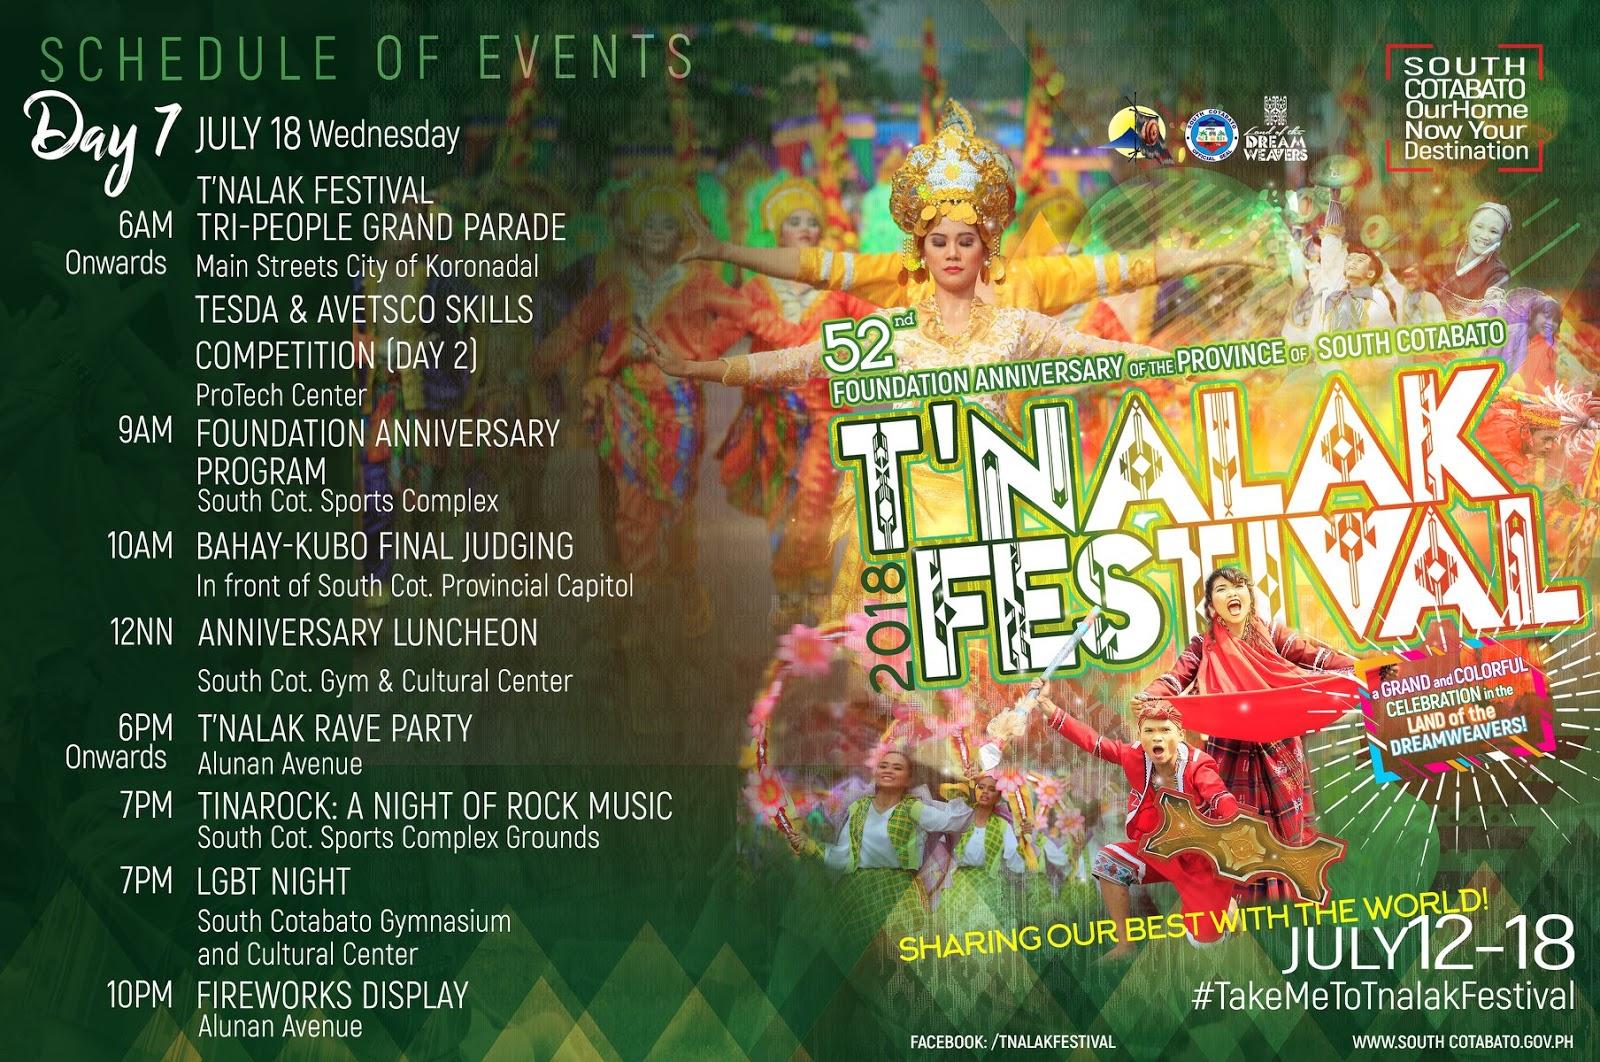 Tnalak Festival na naman! See schedule of activities here